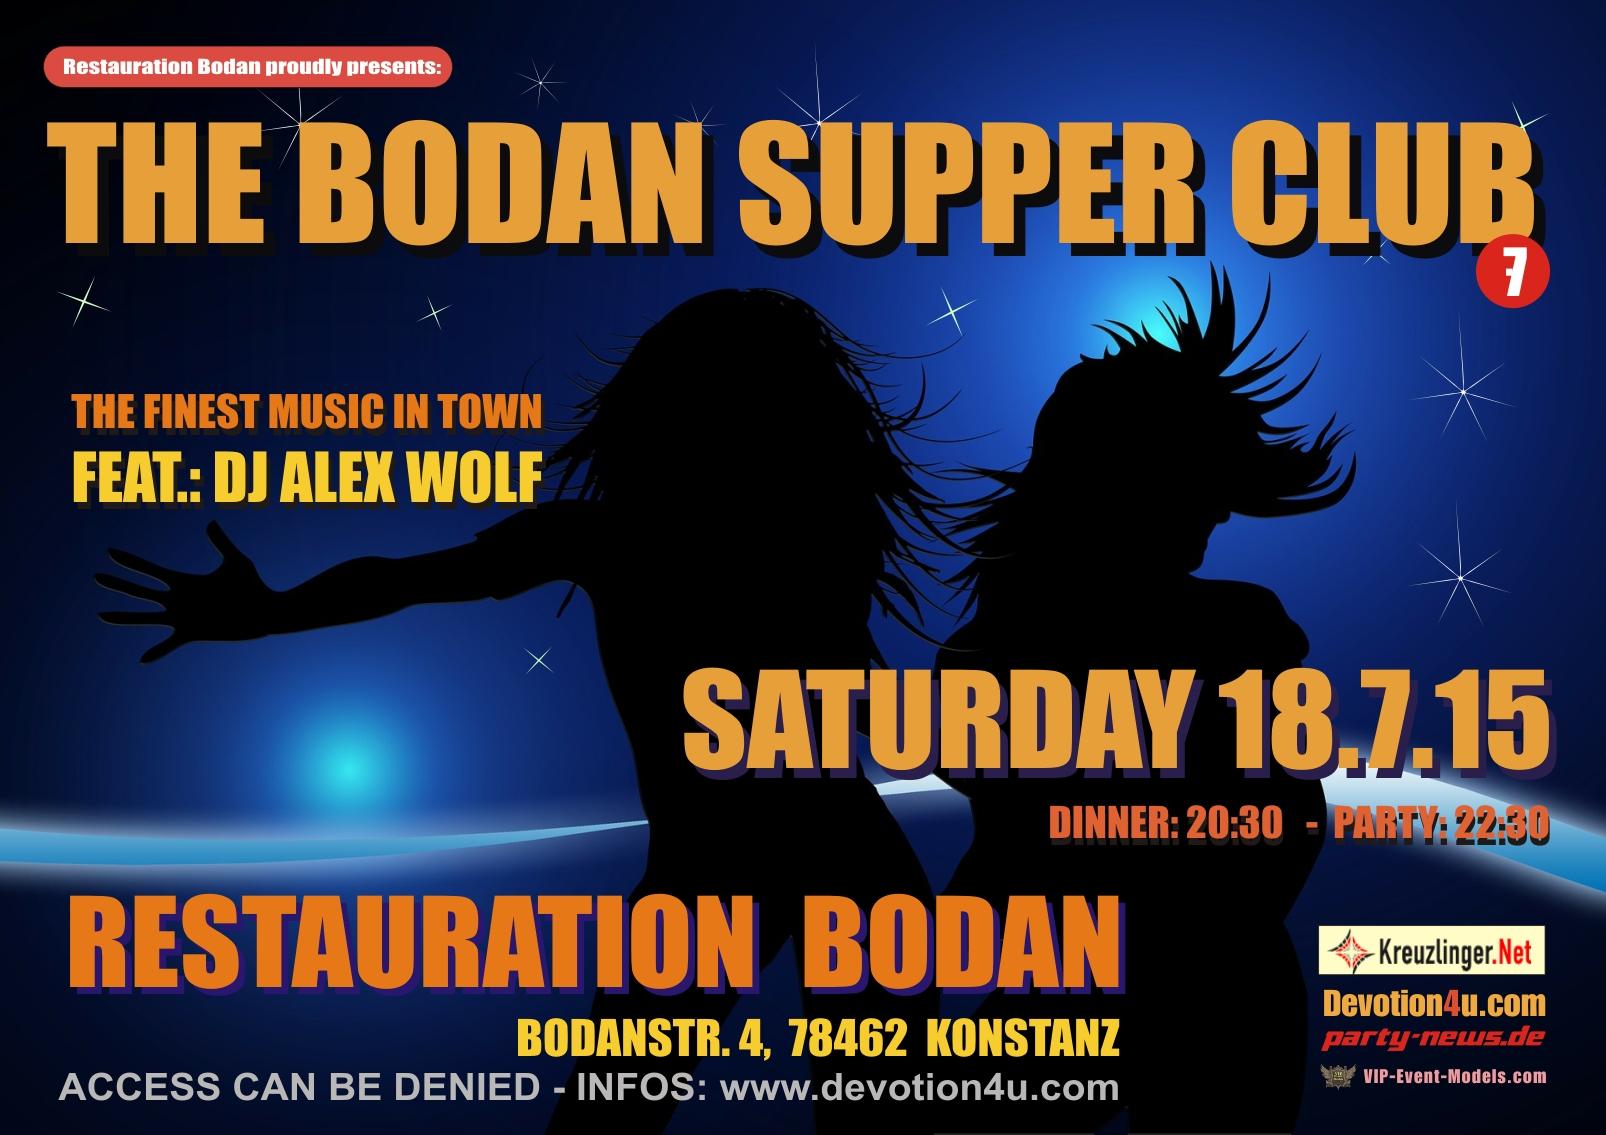 Bodan Supper Club – Sa.18.7.15 – Bodan – Konstanz